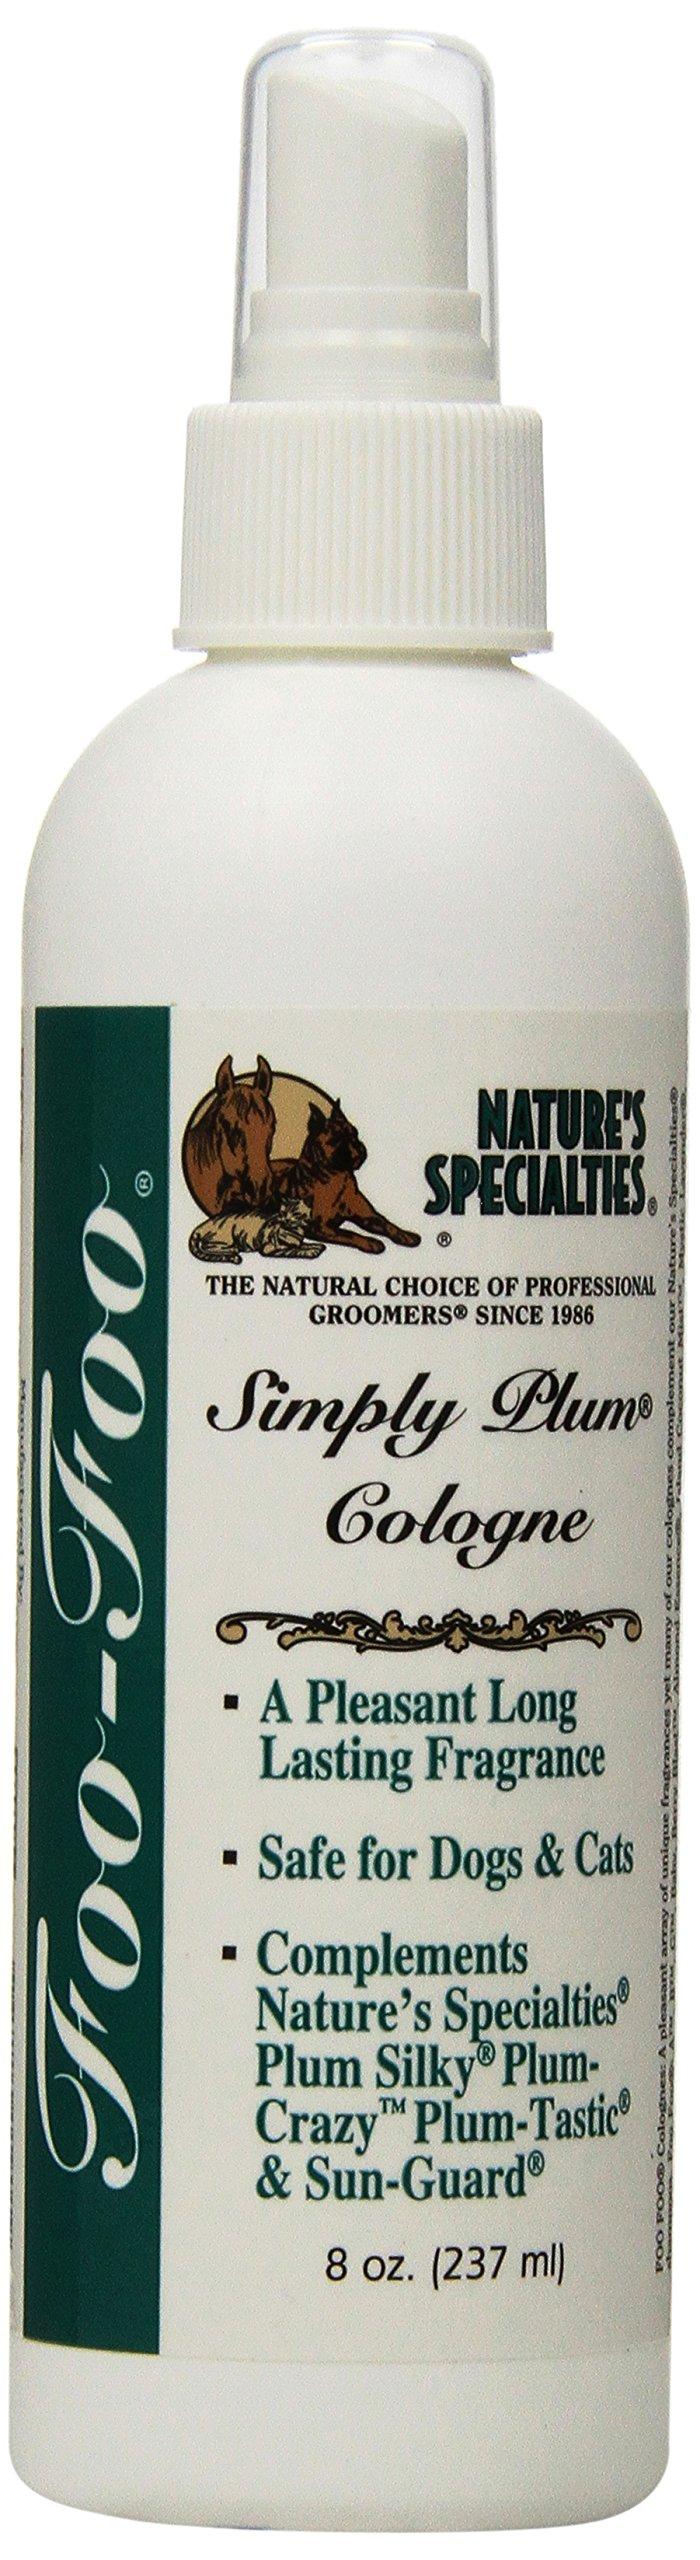 Nature's Specialties Foo Foo Simply Plum Pet Cologne, 8-Ounce by Nature's Specialties